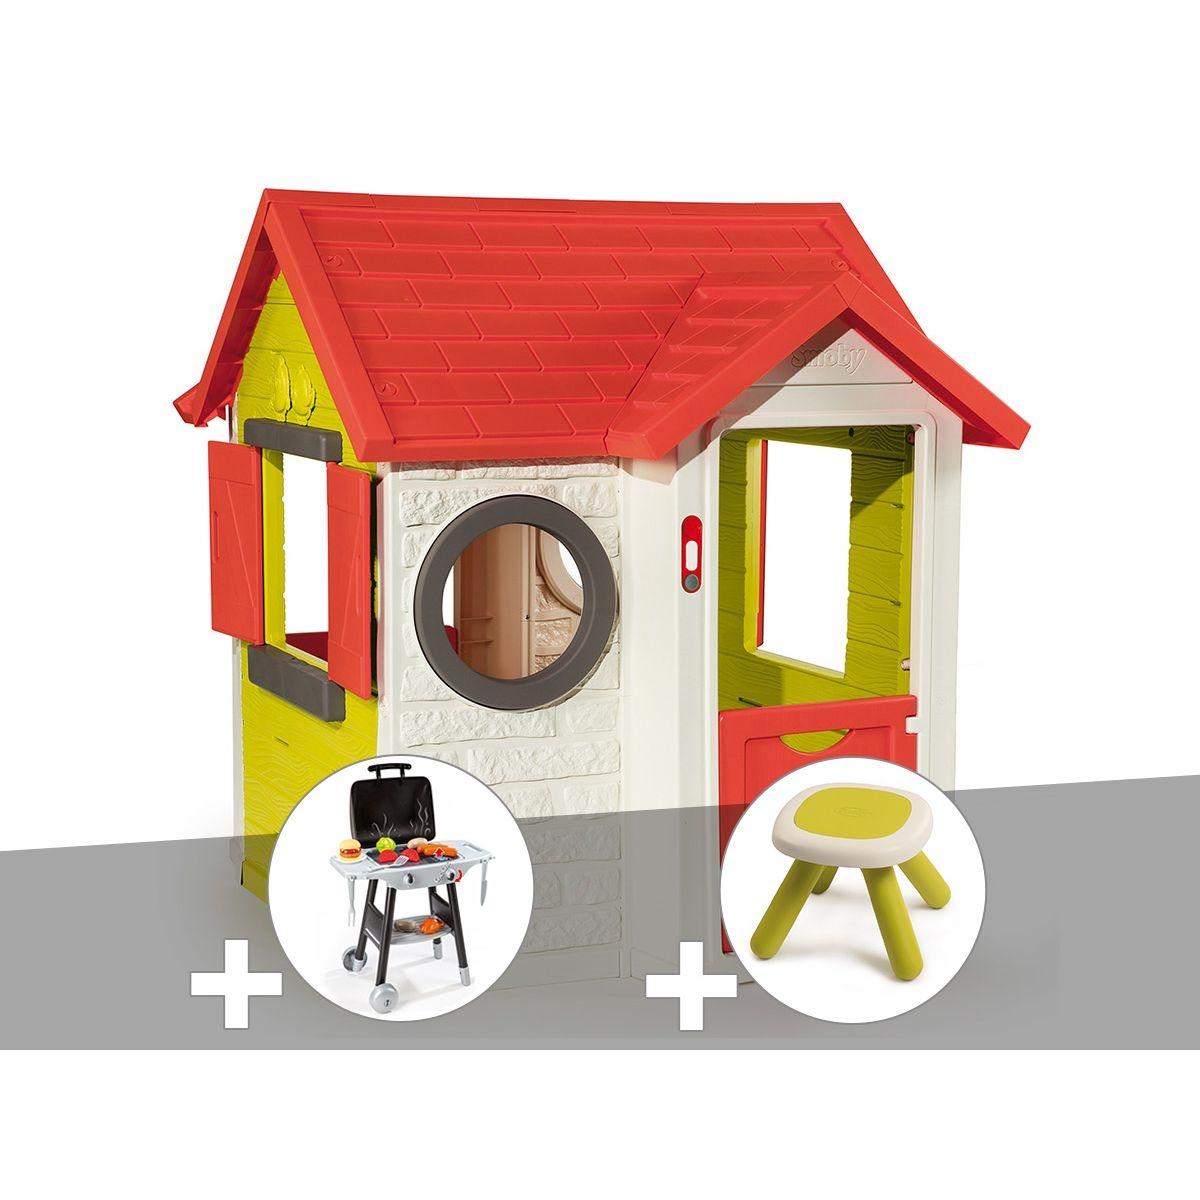 Cabane enfant My House - Smoby + Plancha + Tabouret